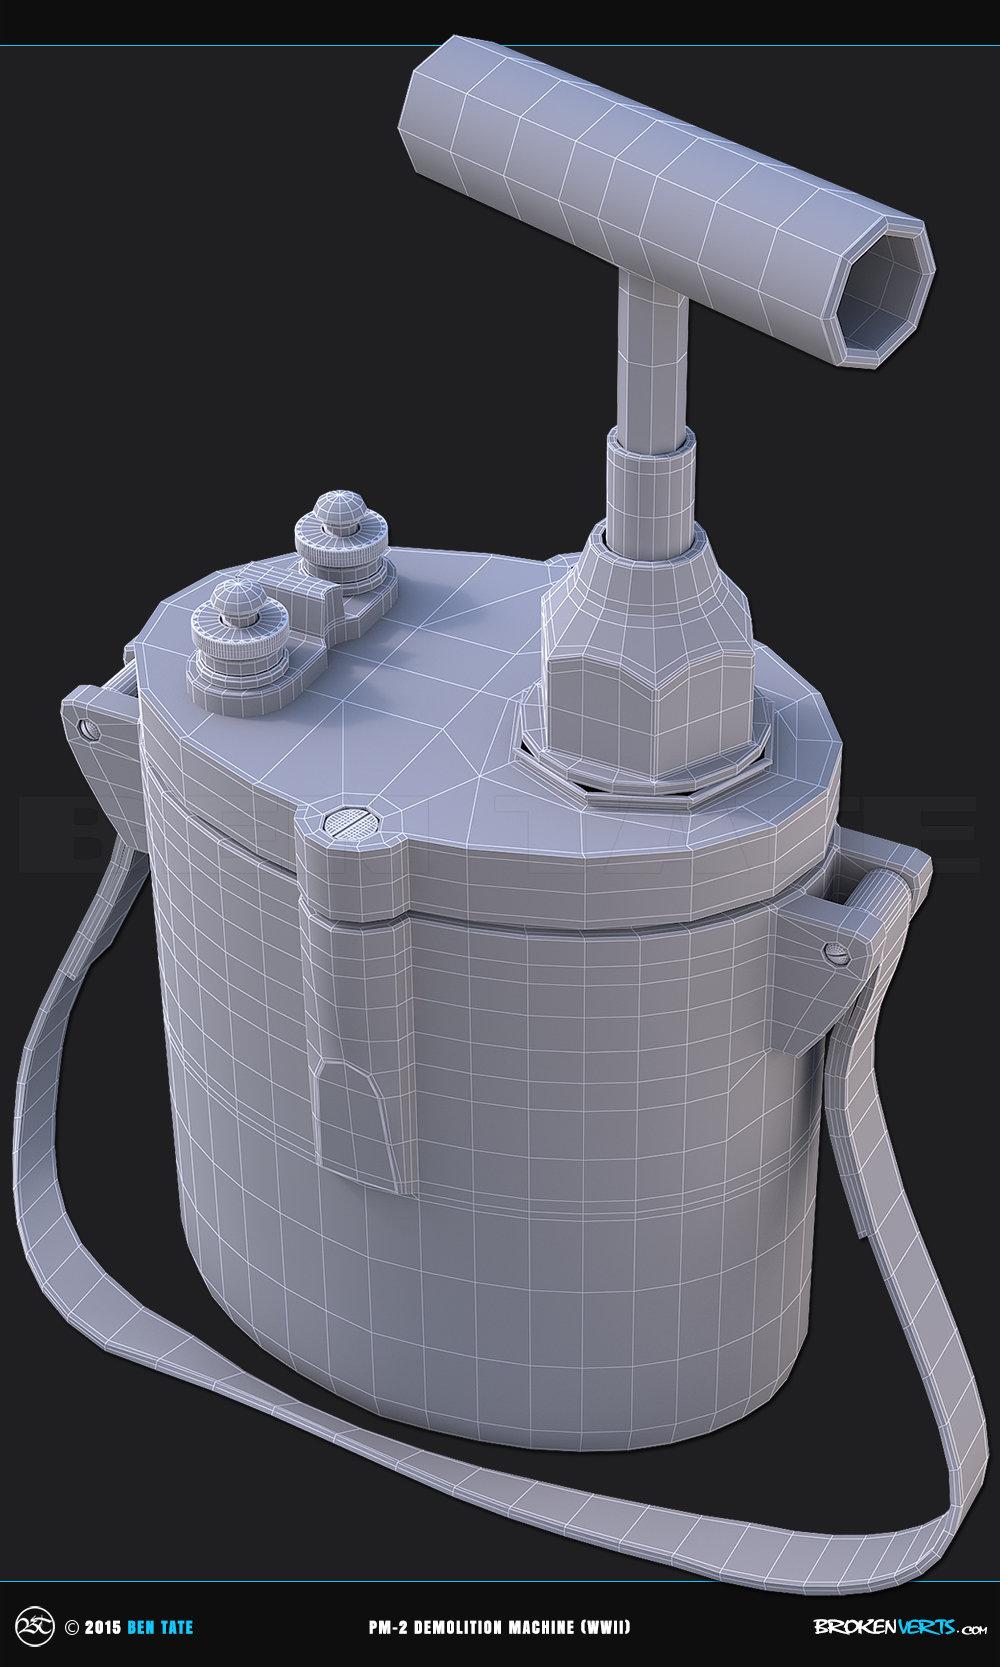 WWII PM-2 Demolition Machine  3D Model | Ben Tate | 3ds Max V-Ray Mari Photoshop |3d CG VFX